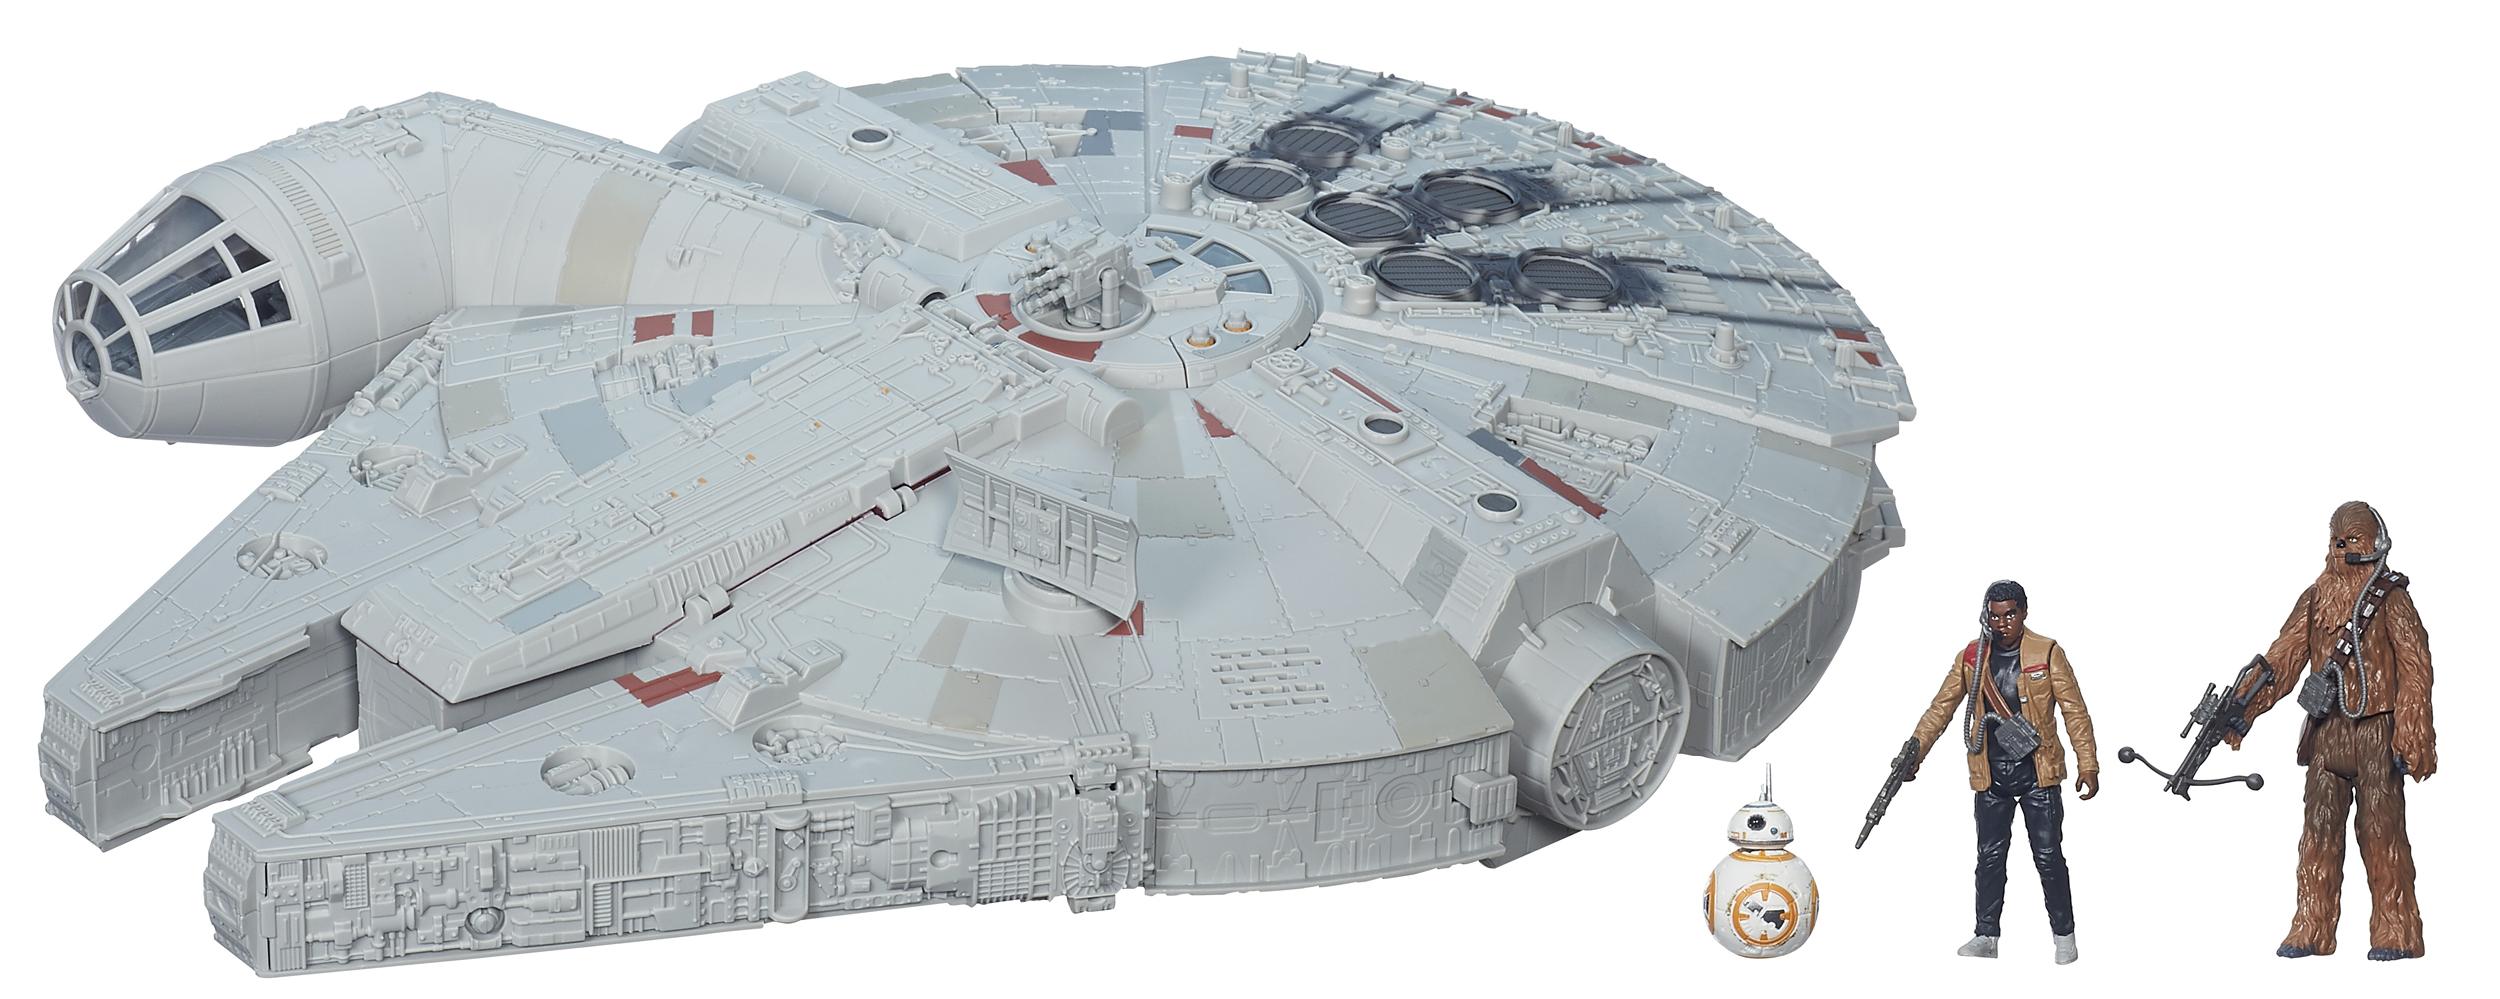 Imange of the Millennium Falcon